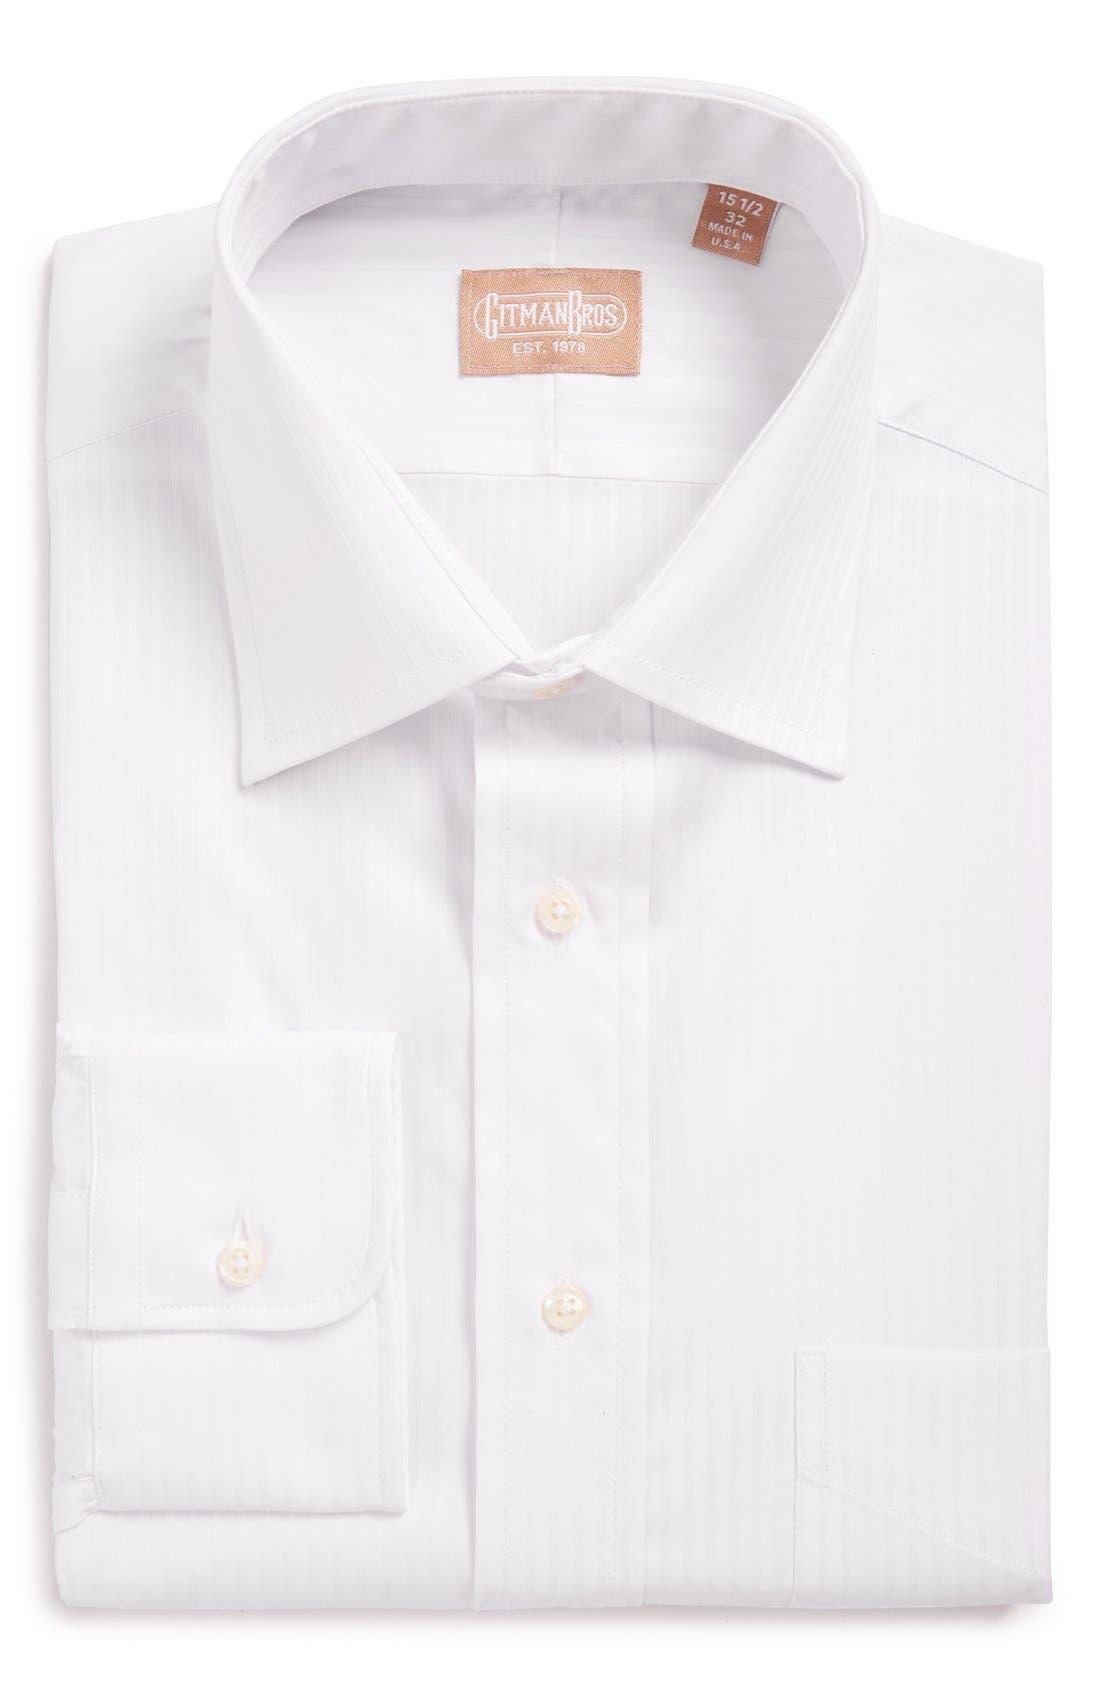 Regular Fit Tonal Stripe Twill Dress Shirt,                             Main thumbnail 1, color,                             100